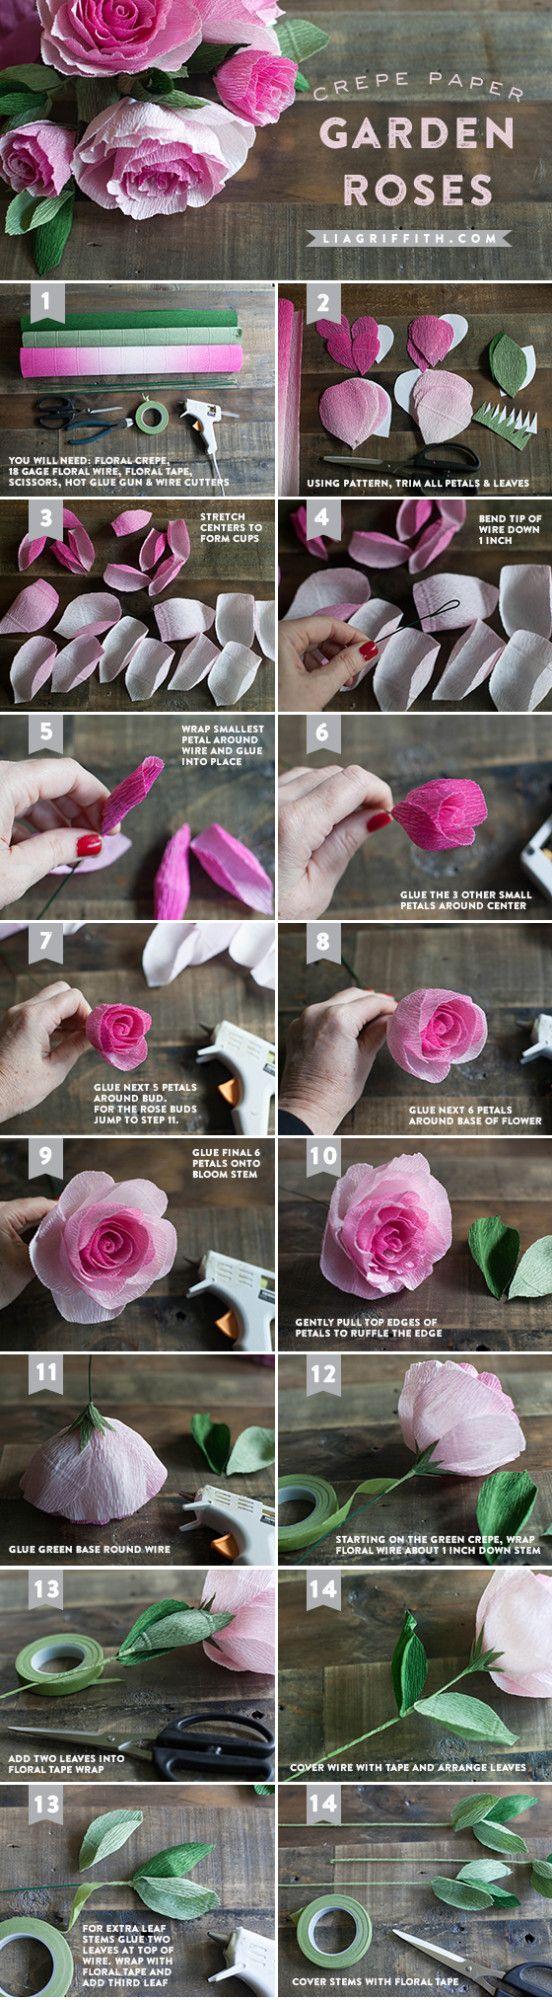 DIY Crepe Paper Ombré Garden Roses